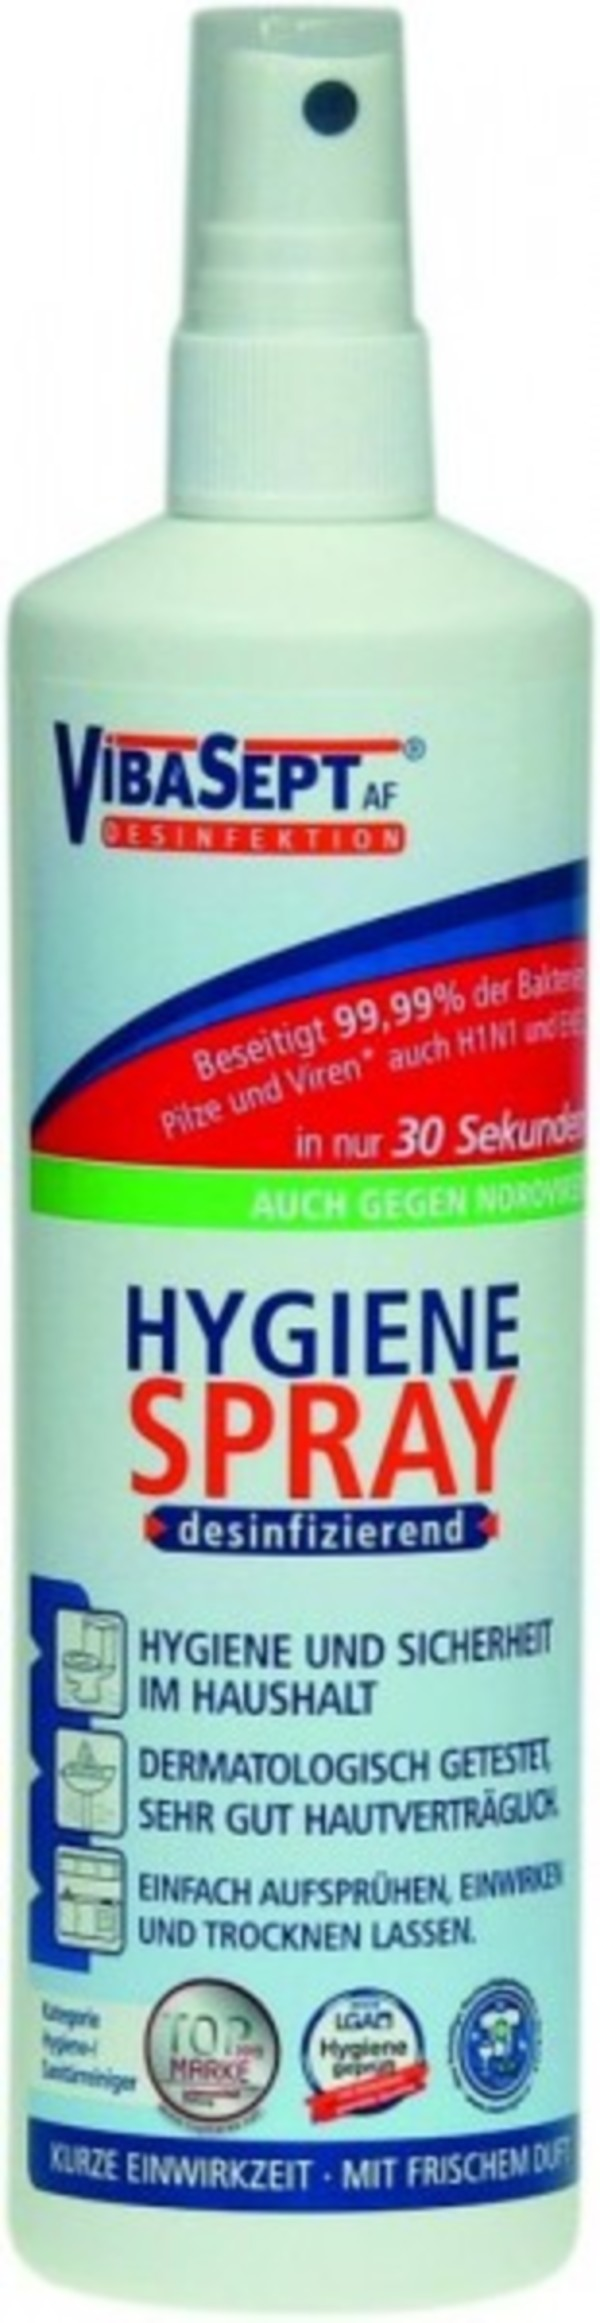 Vibasept Desinfektionsspray 250 ml ,  Flächendesinfektionslösung